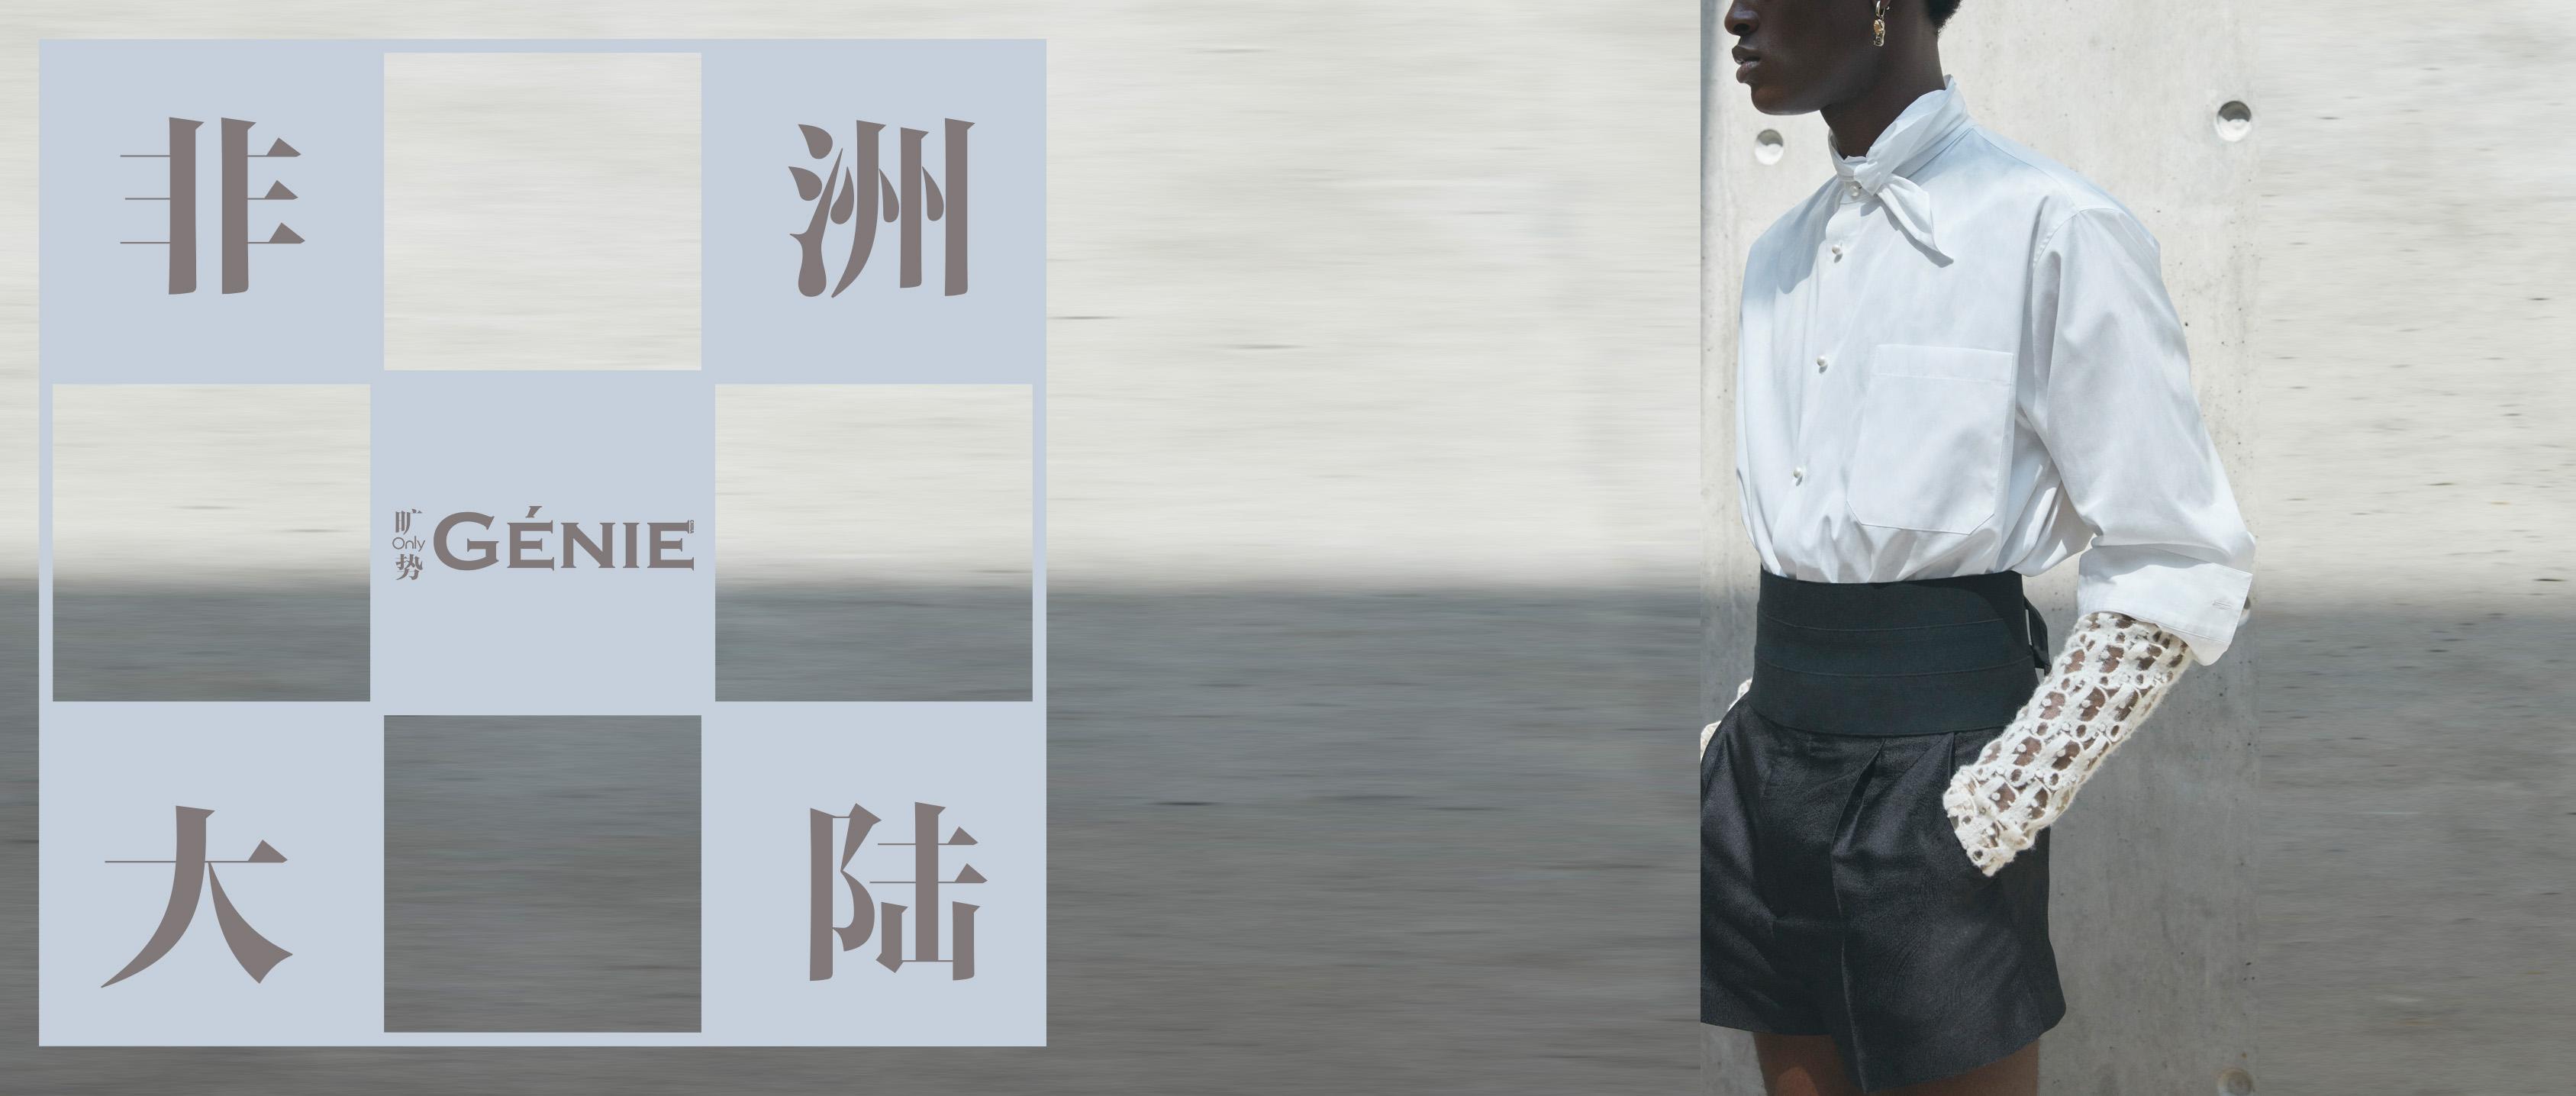 艺术家+男装=DIOR MEN肖像